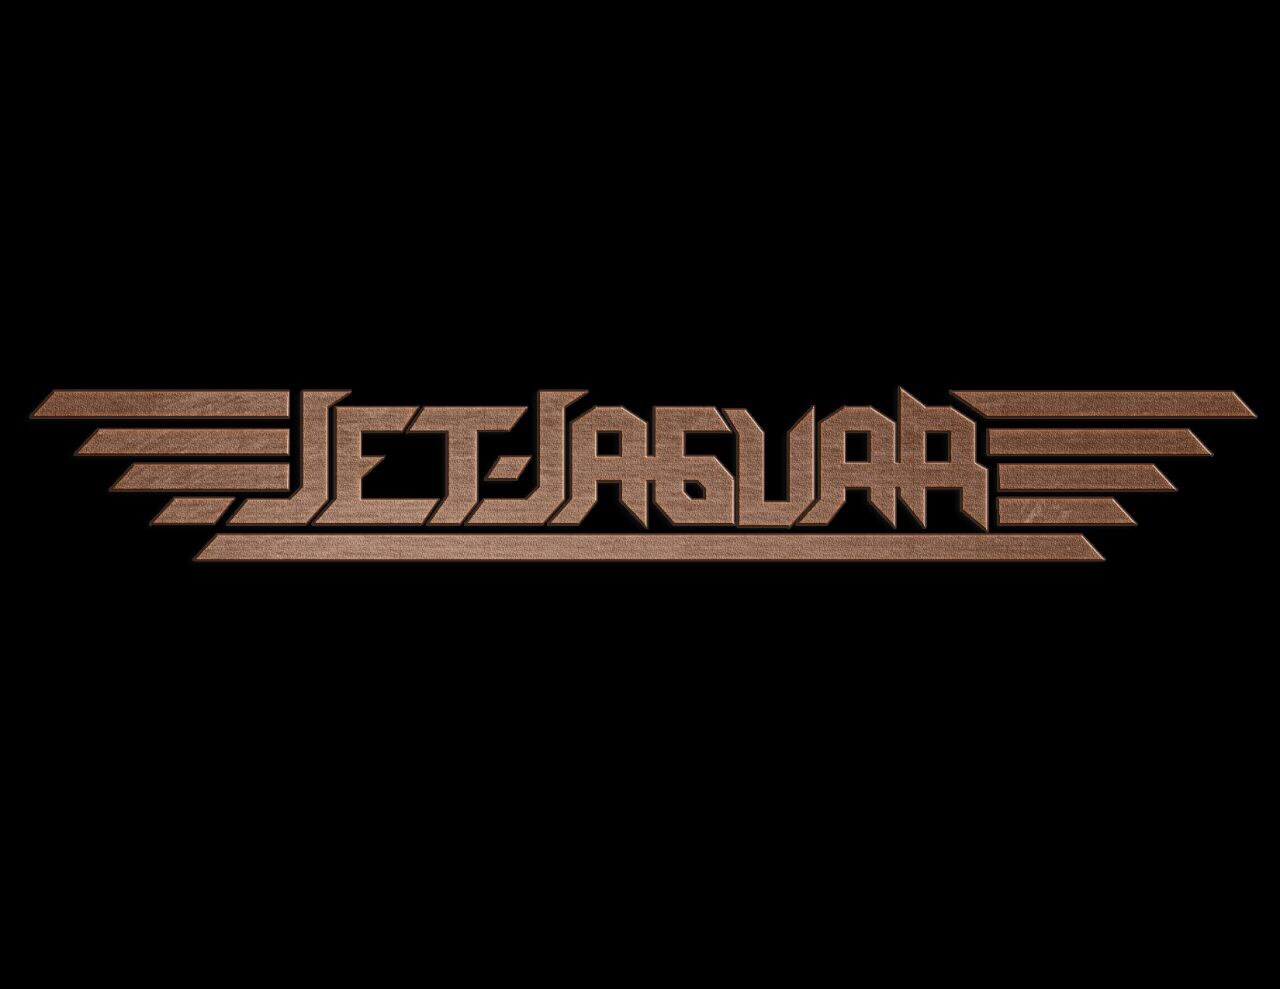 Jet Jaguar